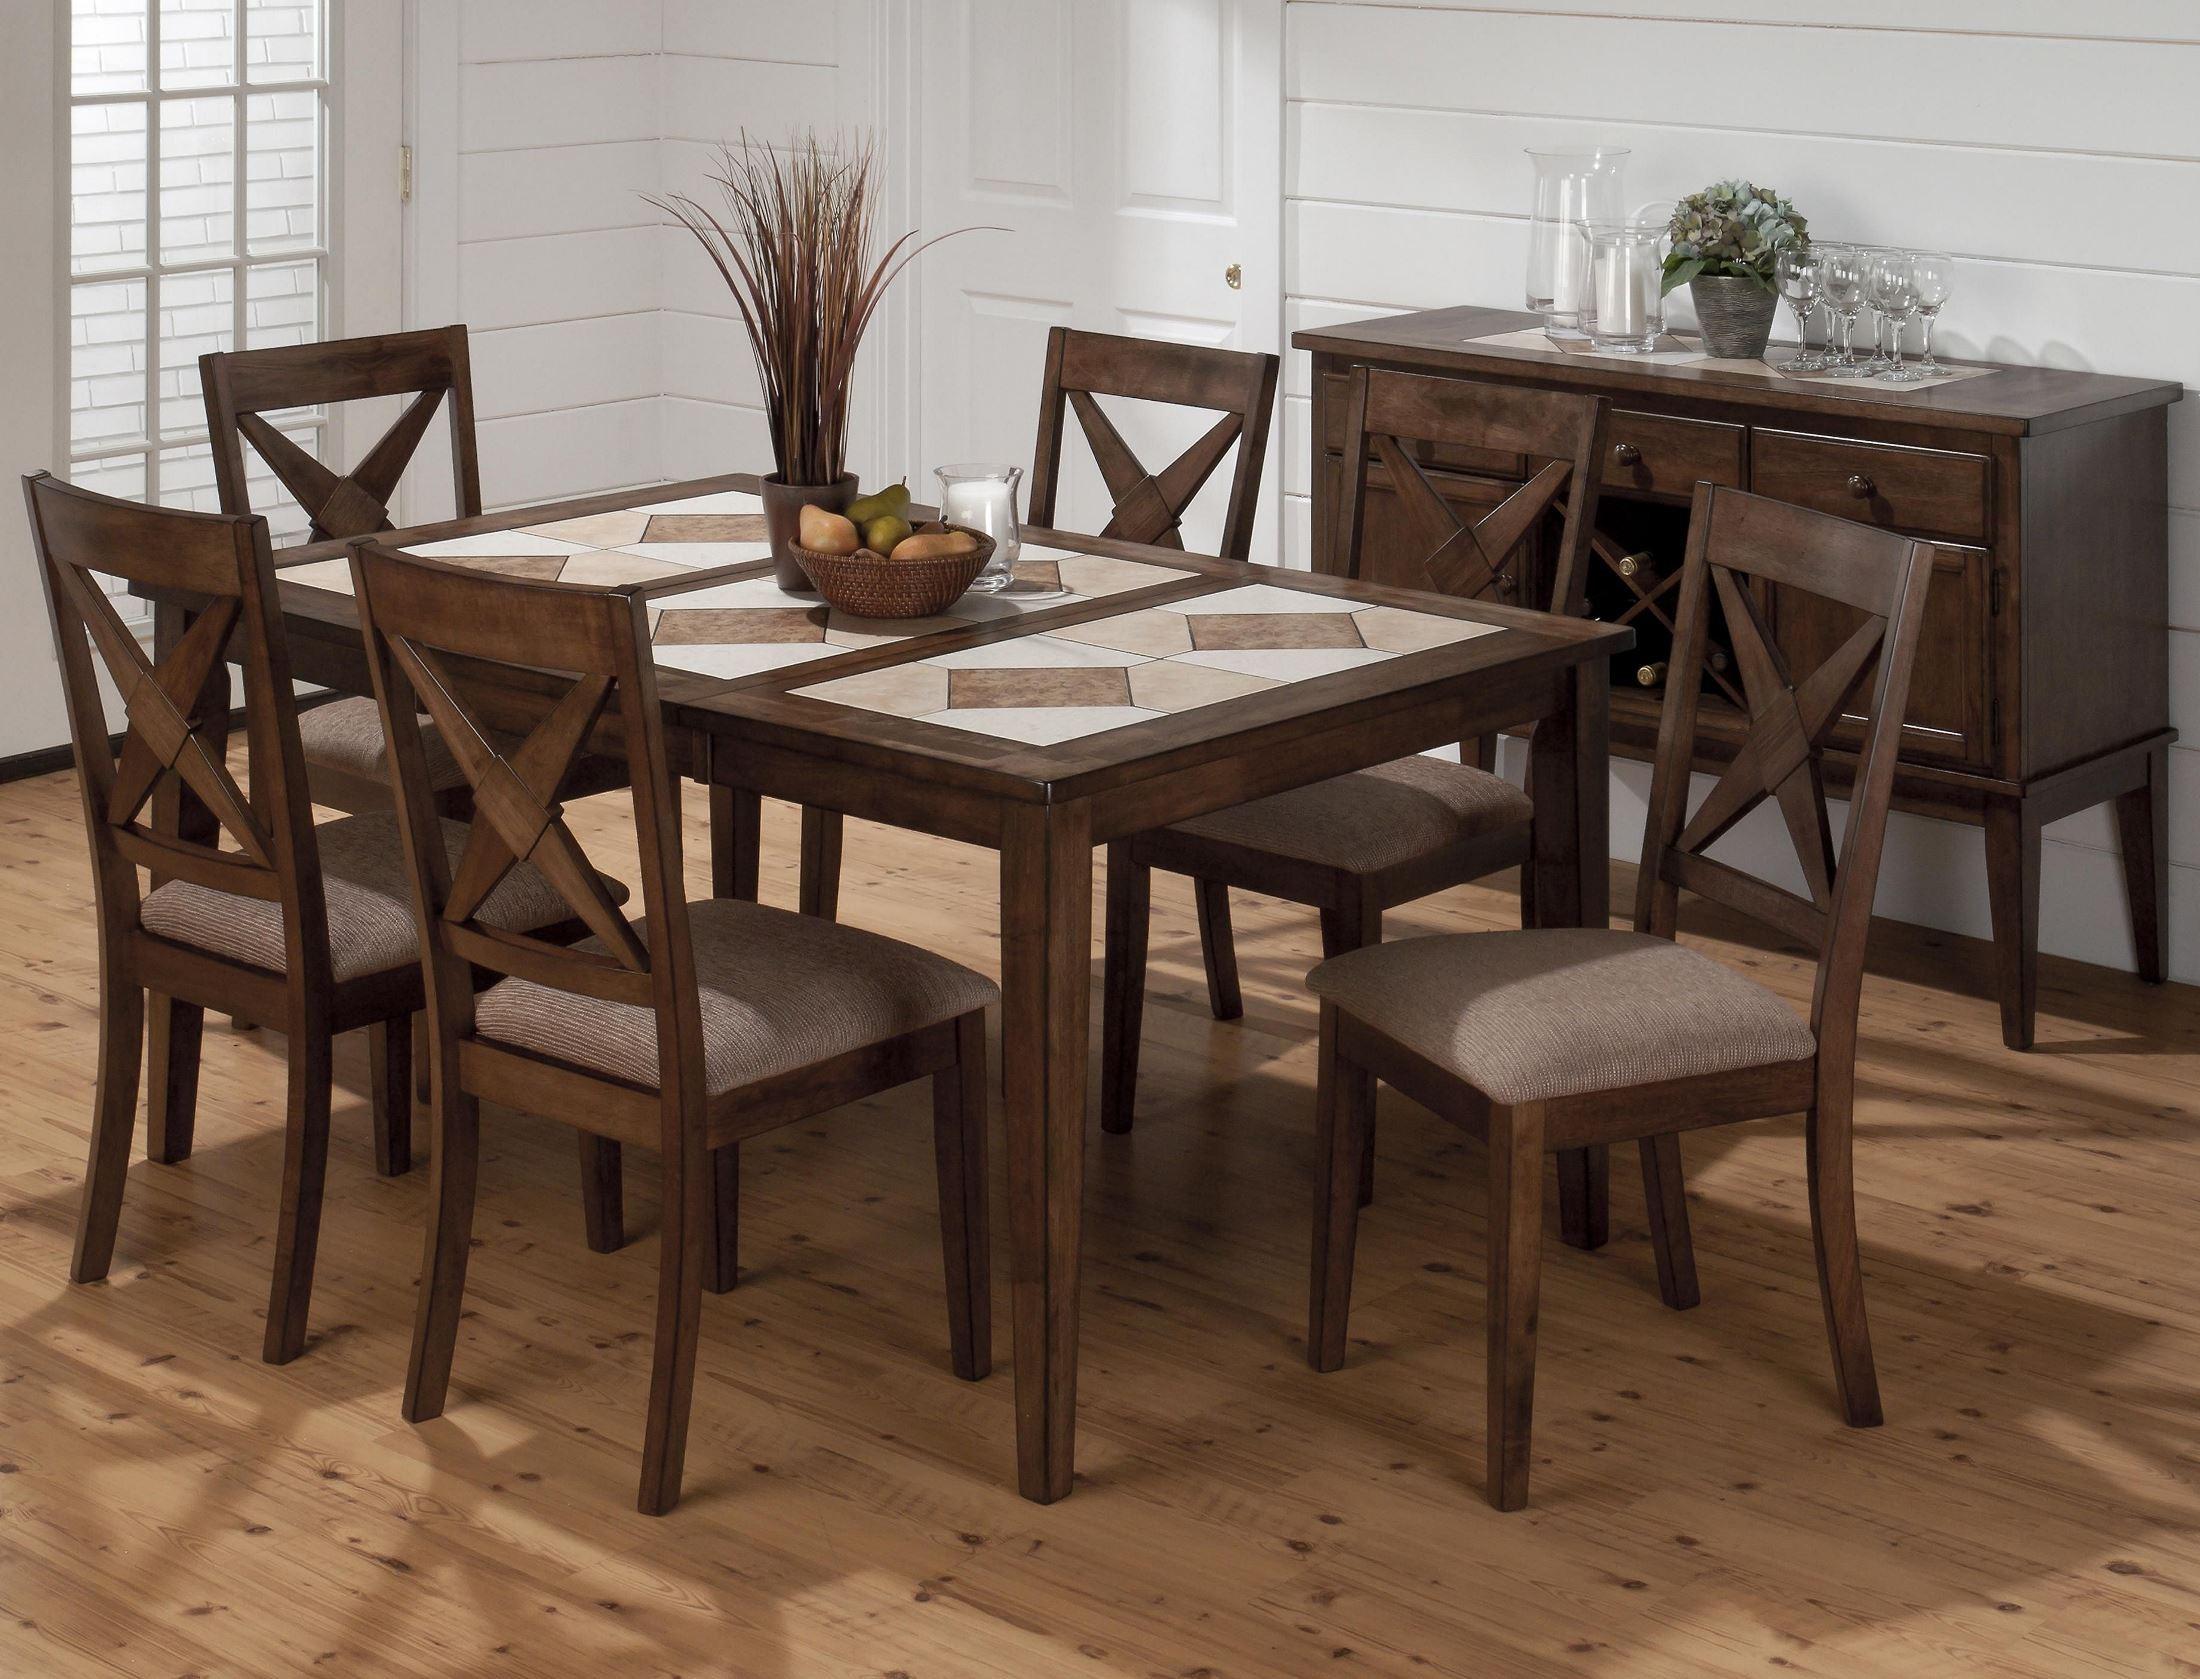 Tucson ceramic tile extendable dining room set jofran